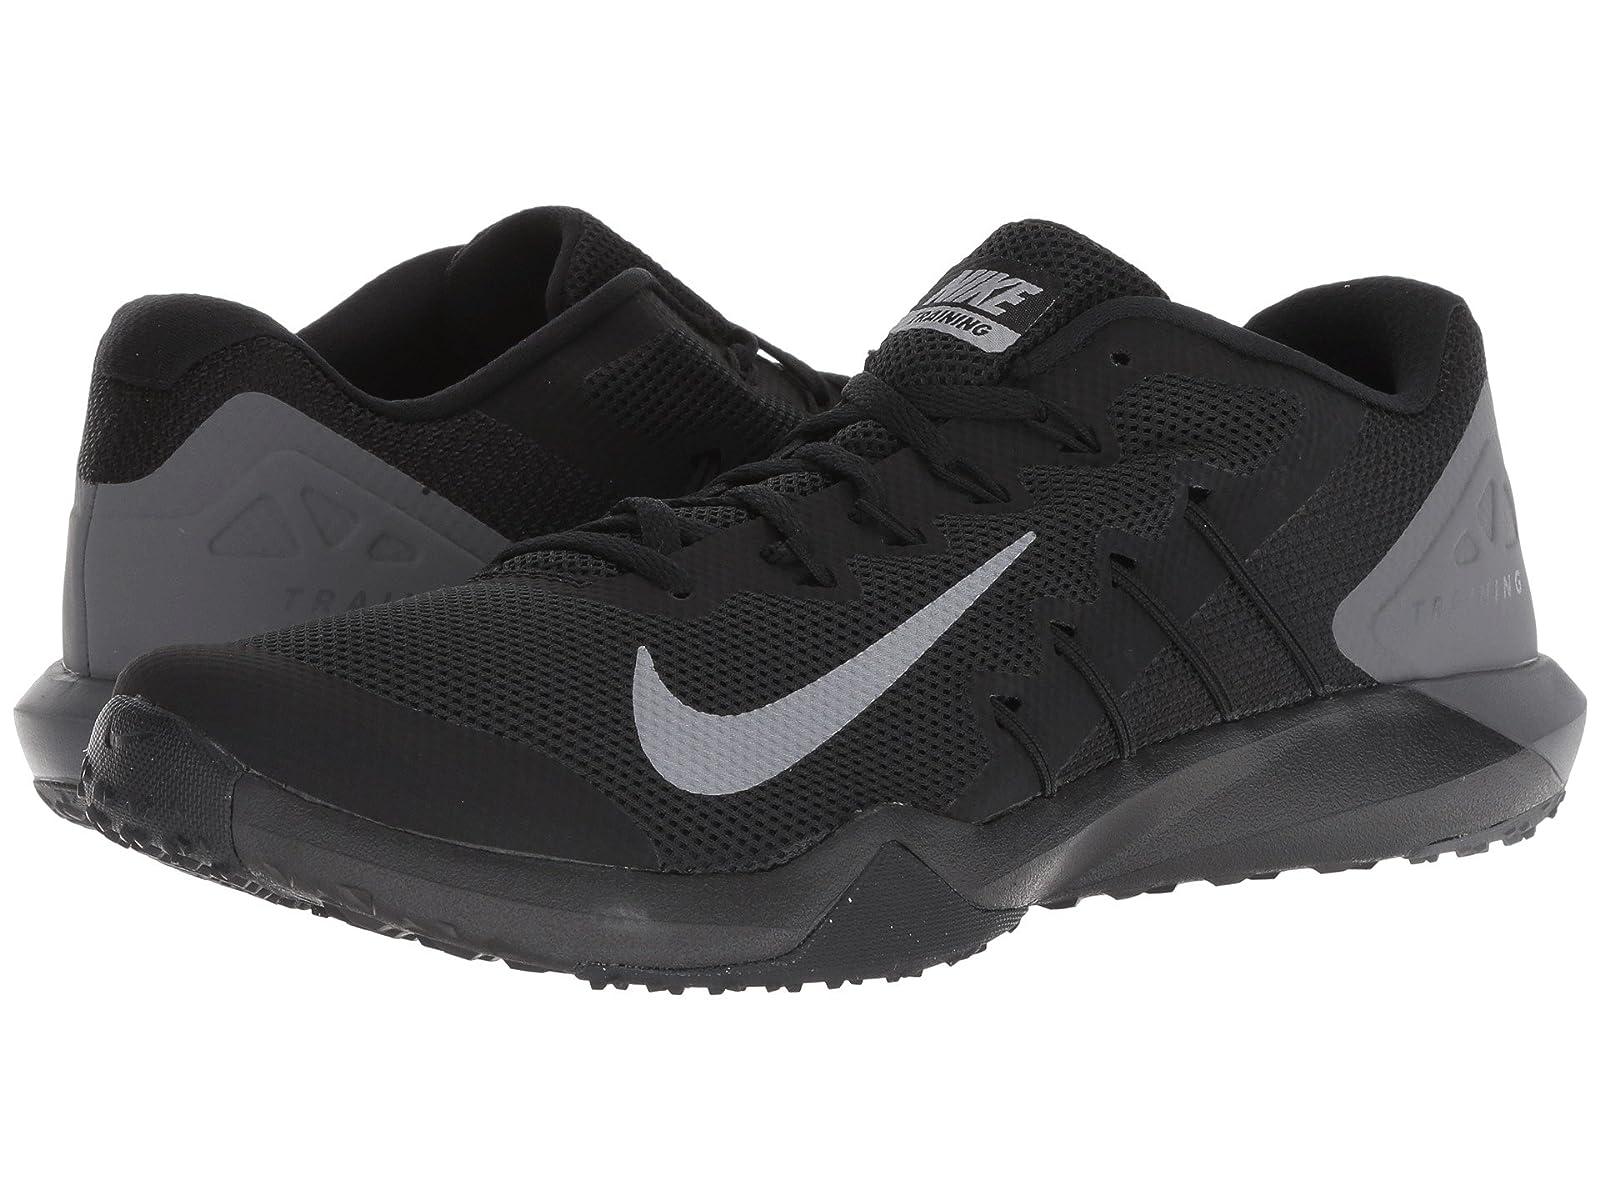 Nike Retaliation Trainer 2Atmospheric grades have affordable shoes